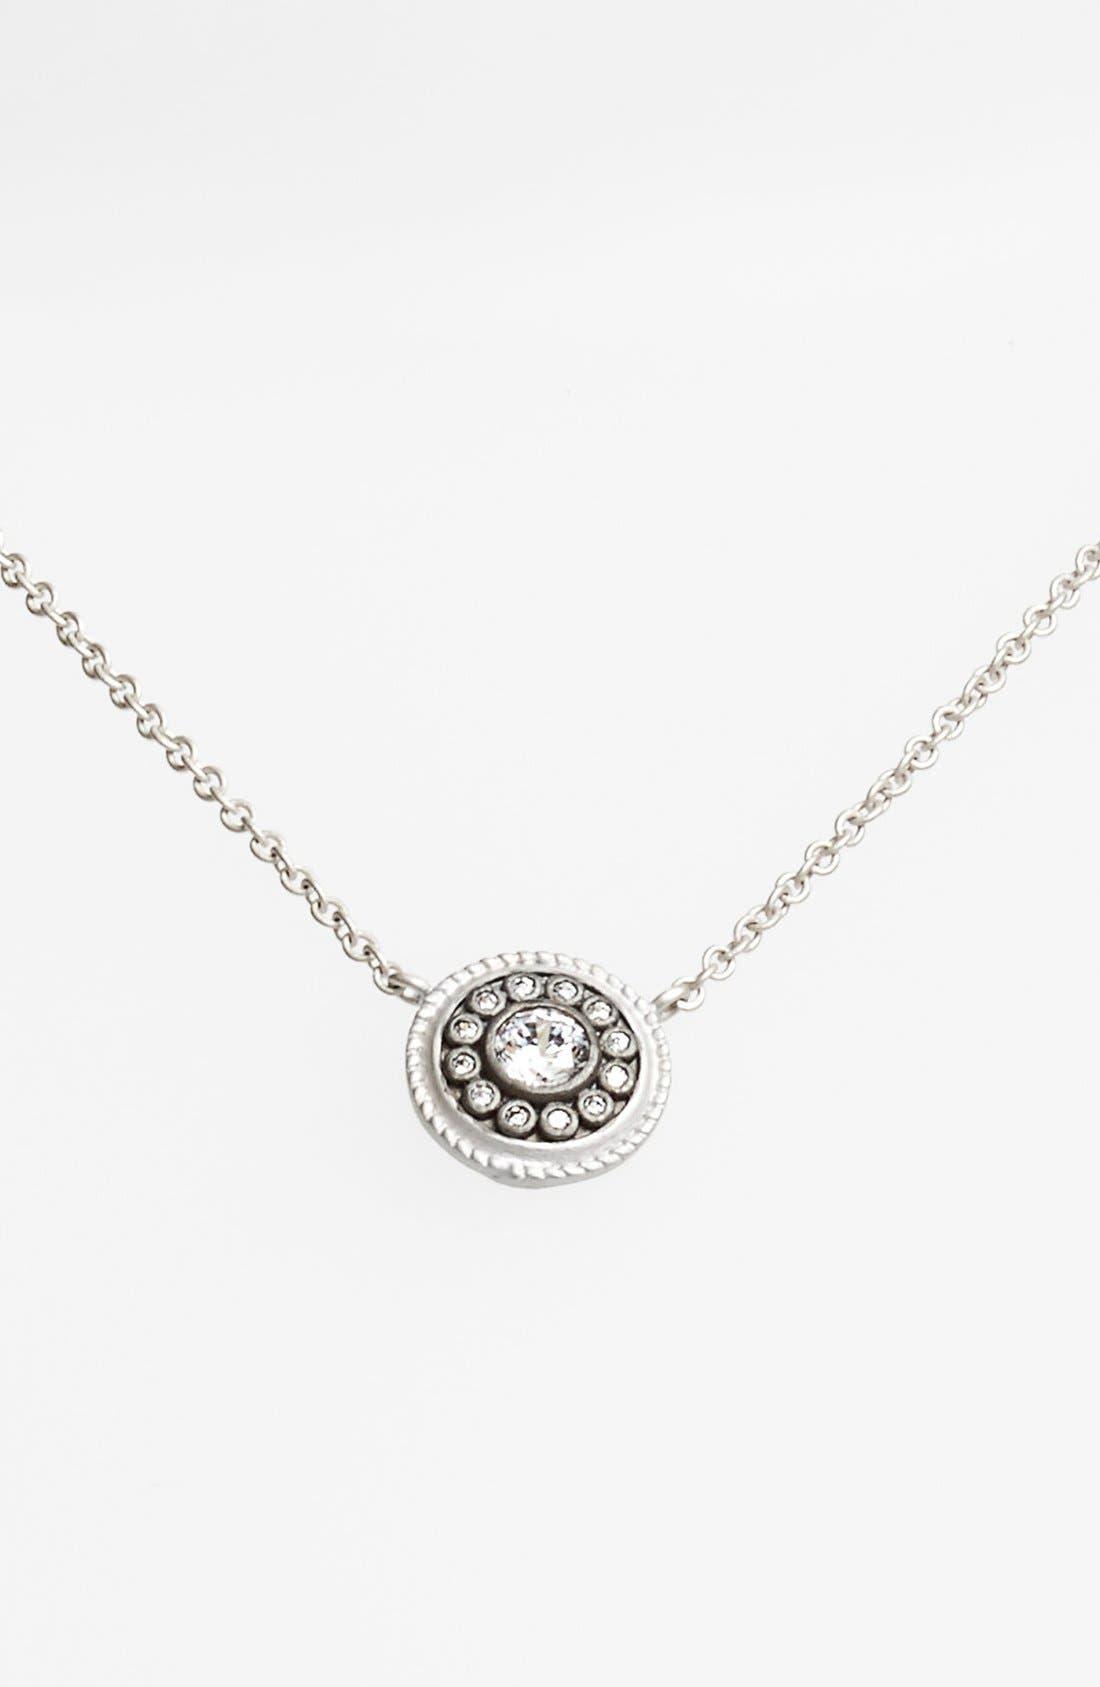 'Hamptons' Nautical Button Pendant Necklace,                         Main,                         color, Silver/ Black